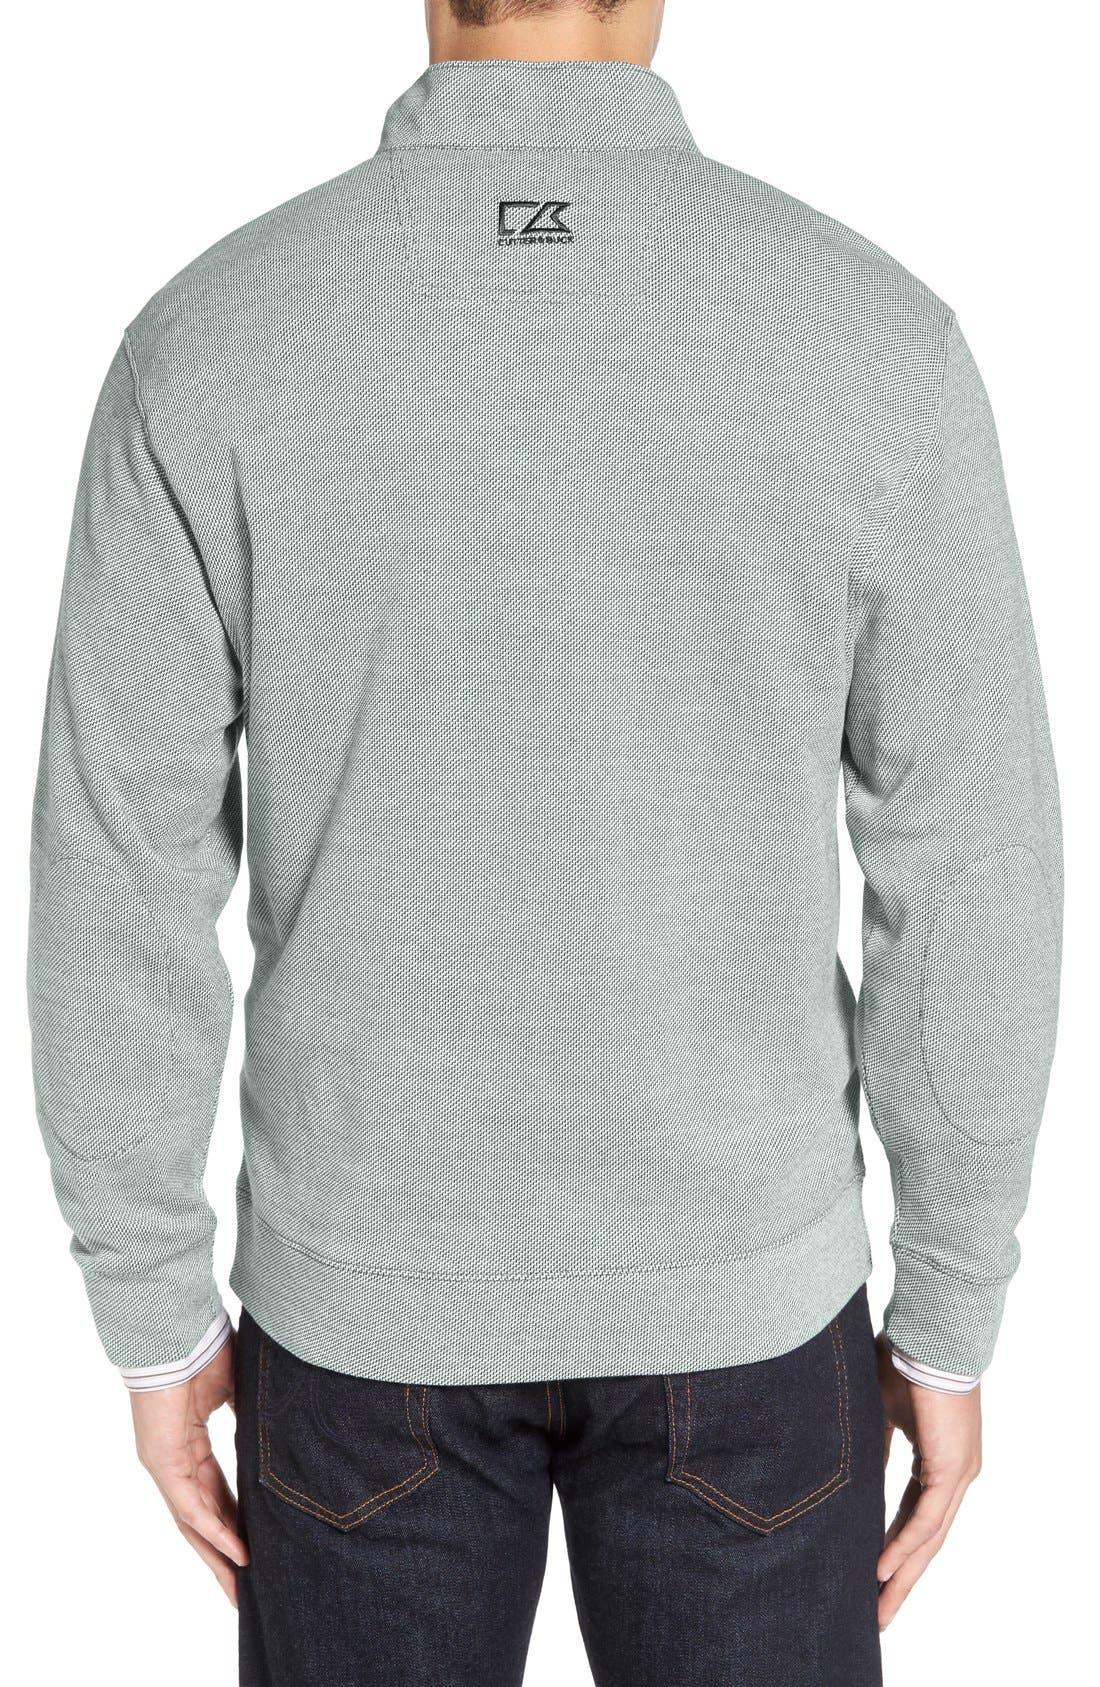 'Quinalt' Mock Neck Pullover,                             Alternate thumbnail 8, color,                             355